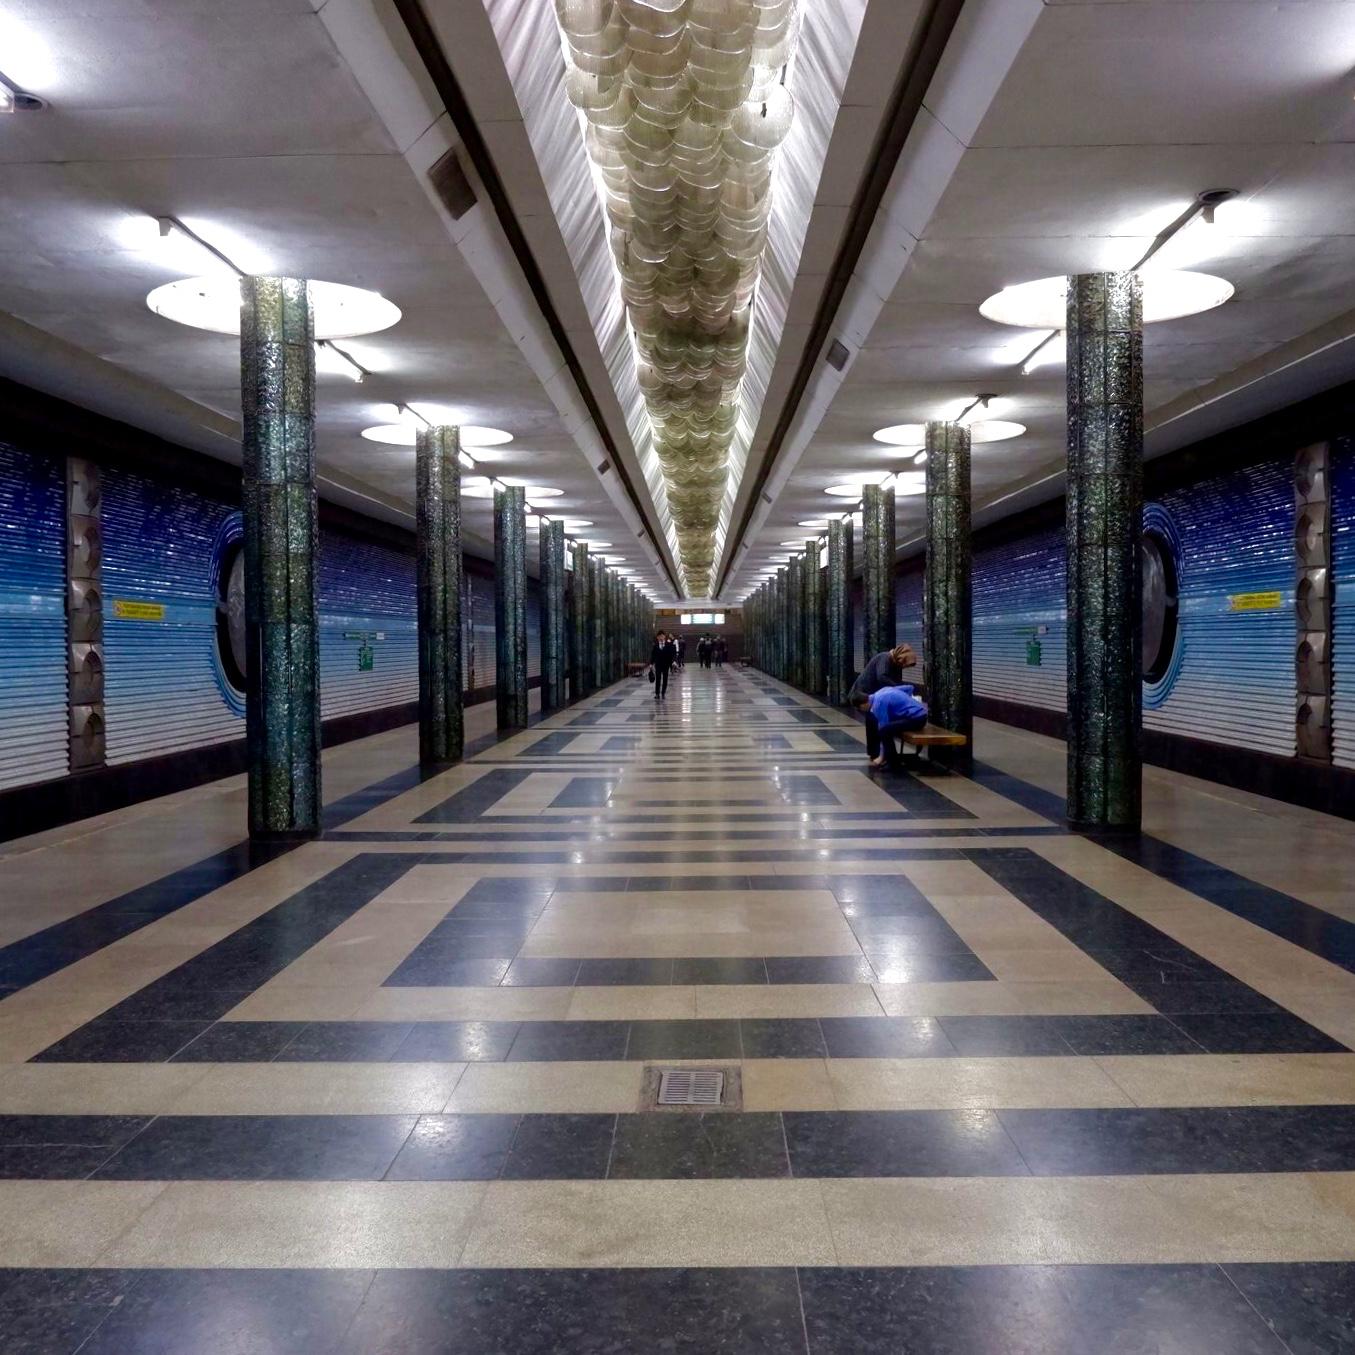 tashkent, uzbekistan - 1 (4)